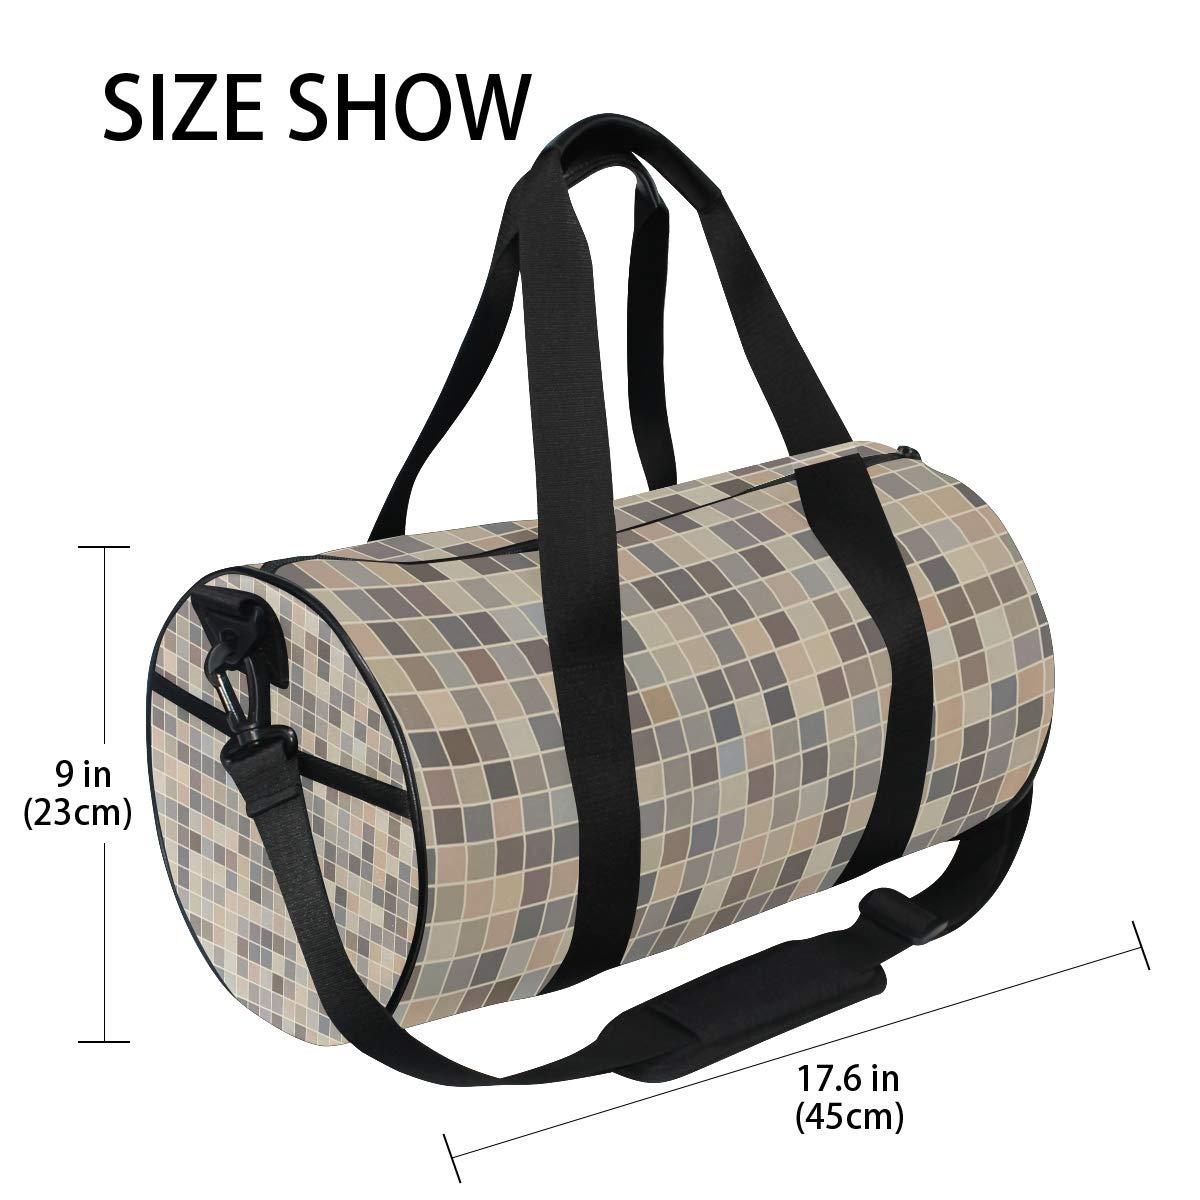 Ordinary Ceramic PictureWaterproof Non-Slip Wearable Crossbody Bag fitness bag Shoulder Bag